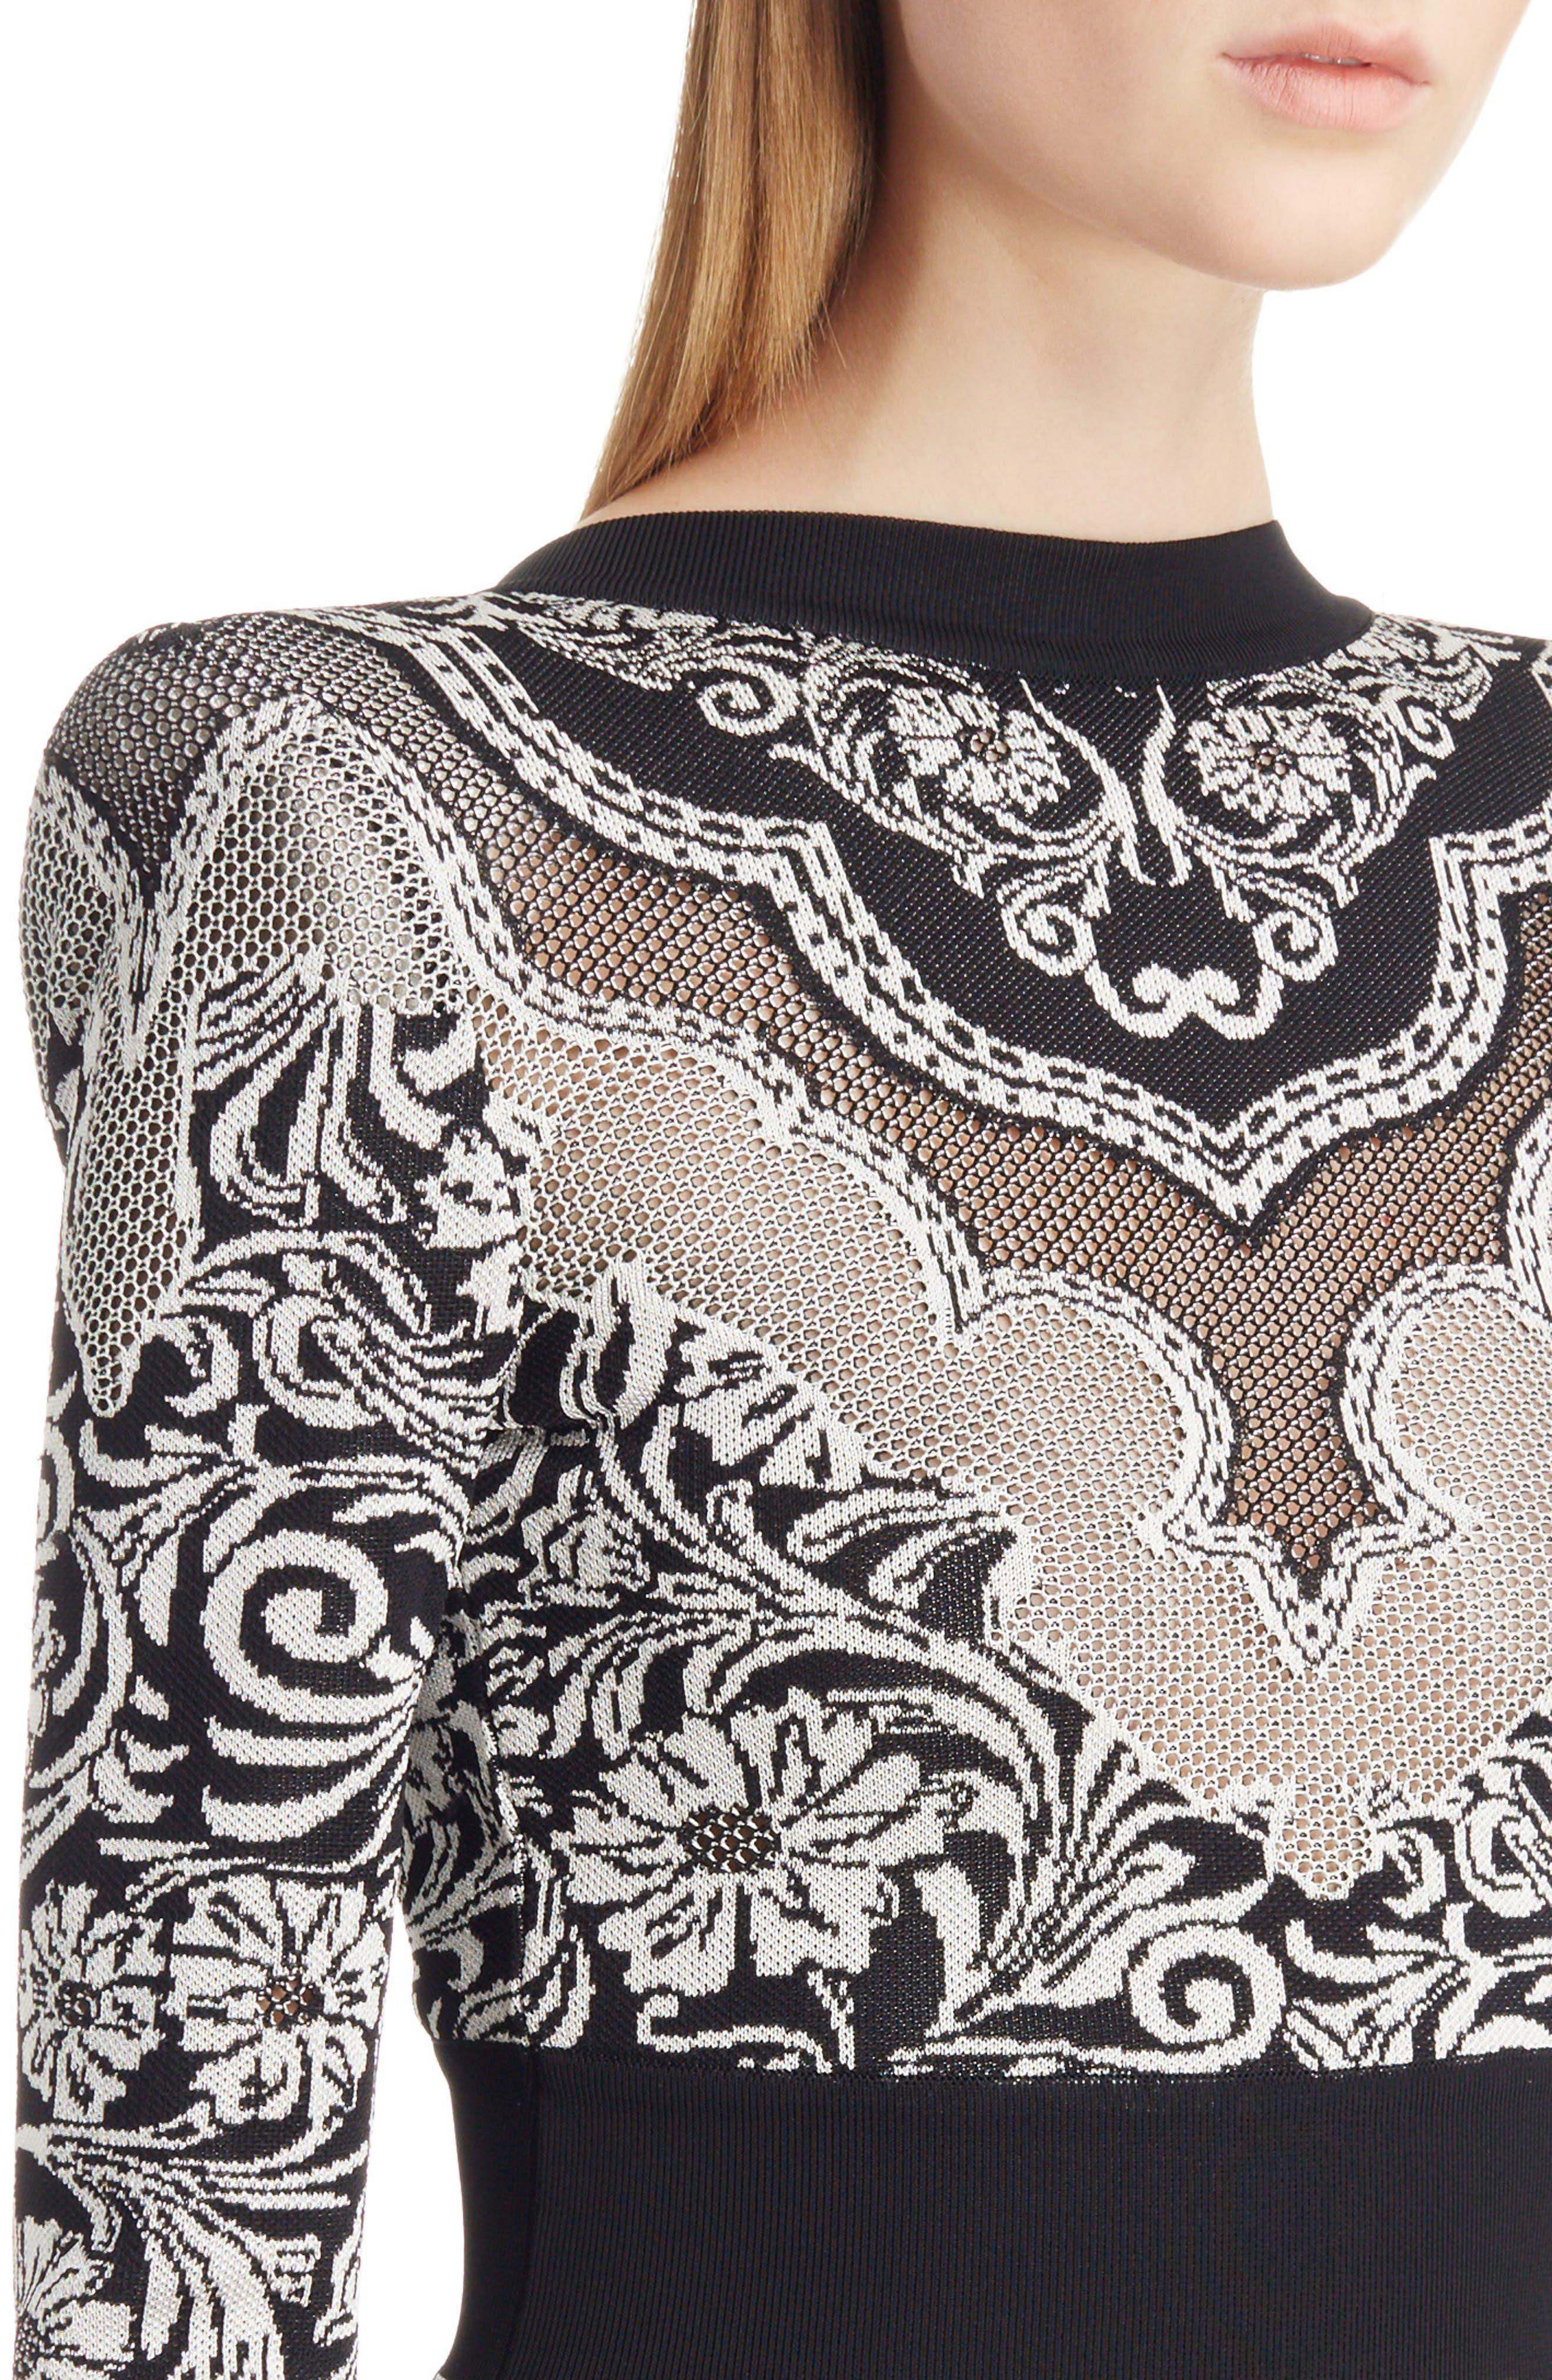 Baroque Knit Minidress,                             Alternate thumbnail 4, color,                             Black And White